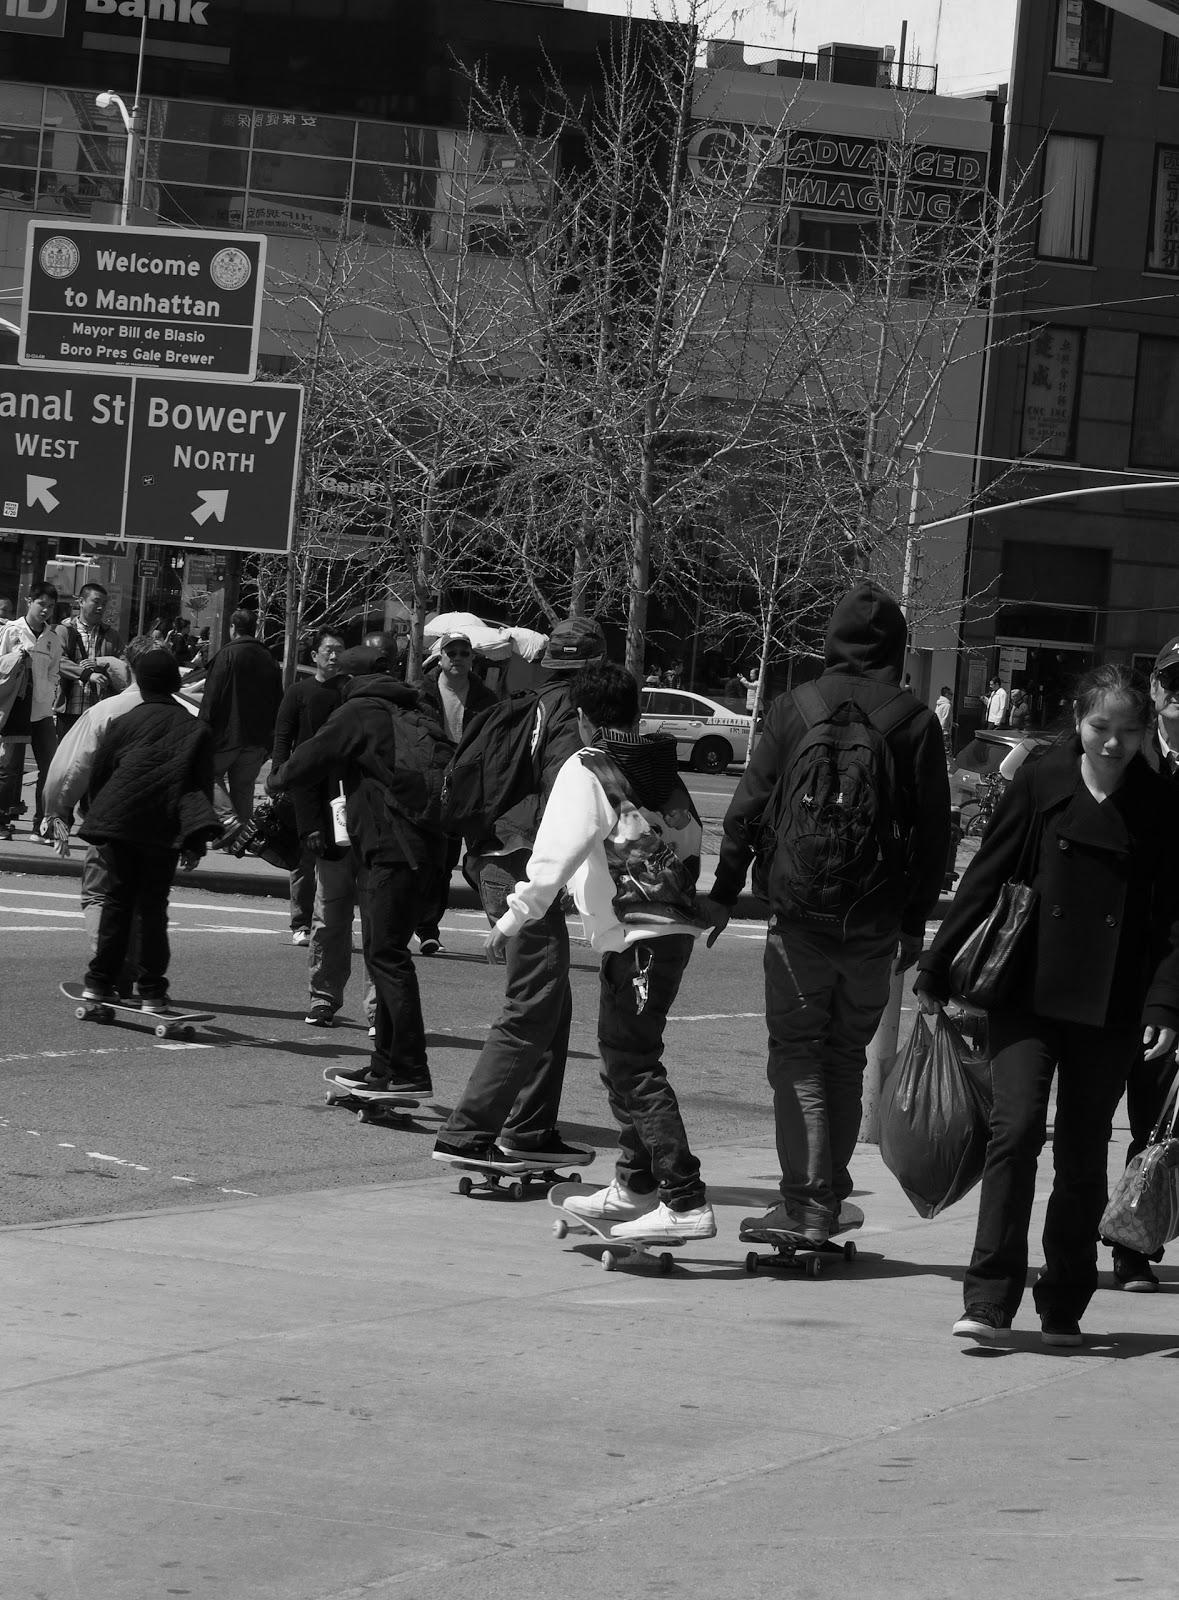 Skateboard Lineup #skateboarders #nyc #nycstreetscenes 2014